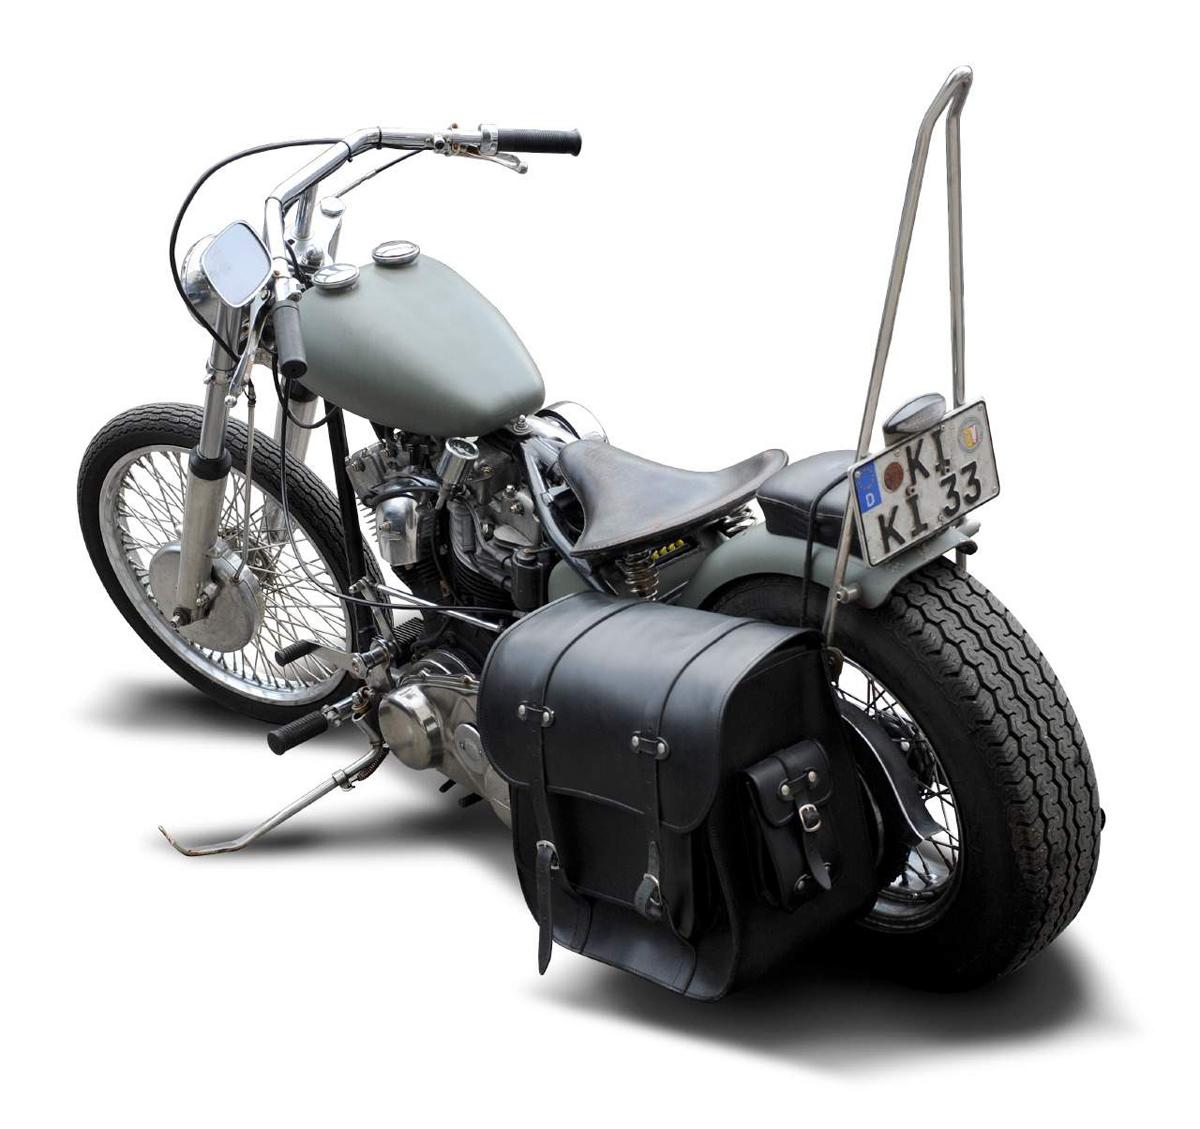 satteltasche 36ltr harley davidson breakout packtasche motorradtasche hd bag ebay. Black Bedroom Furniture Sets. Home Design Ideas